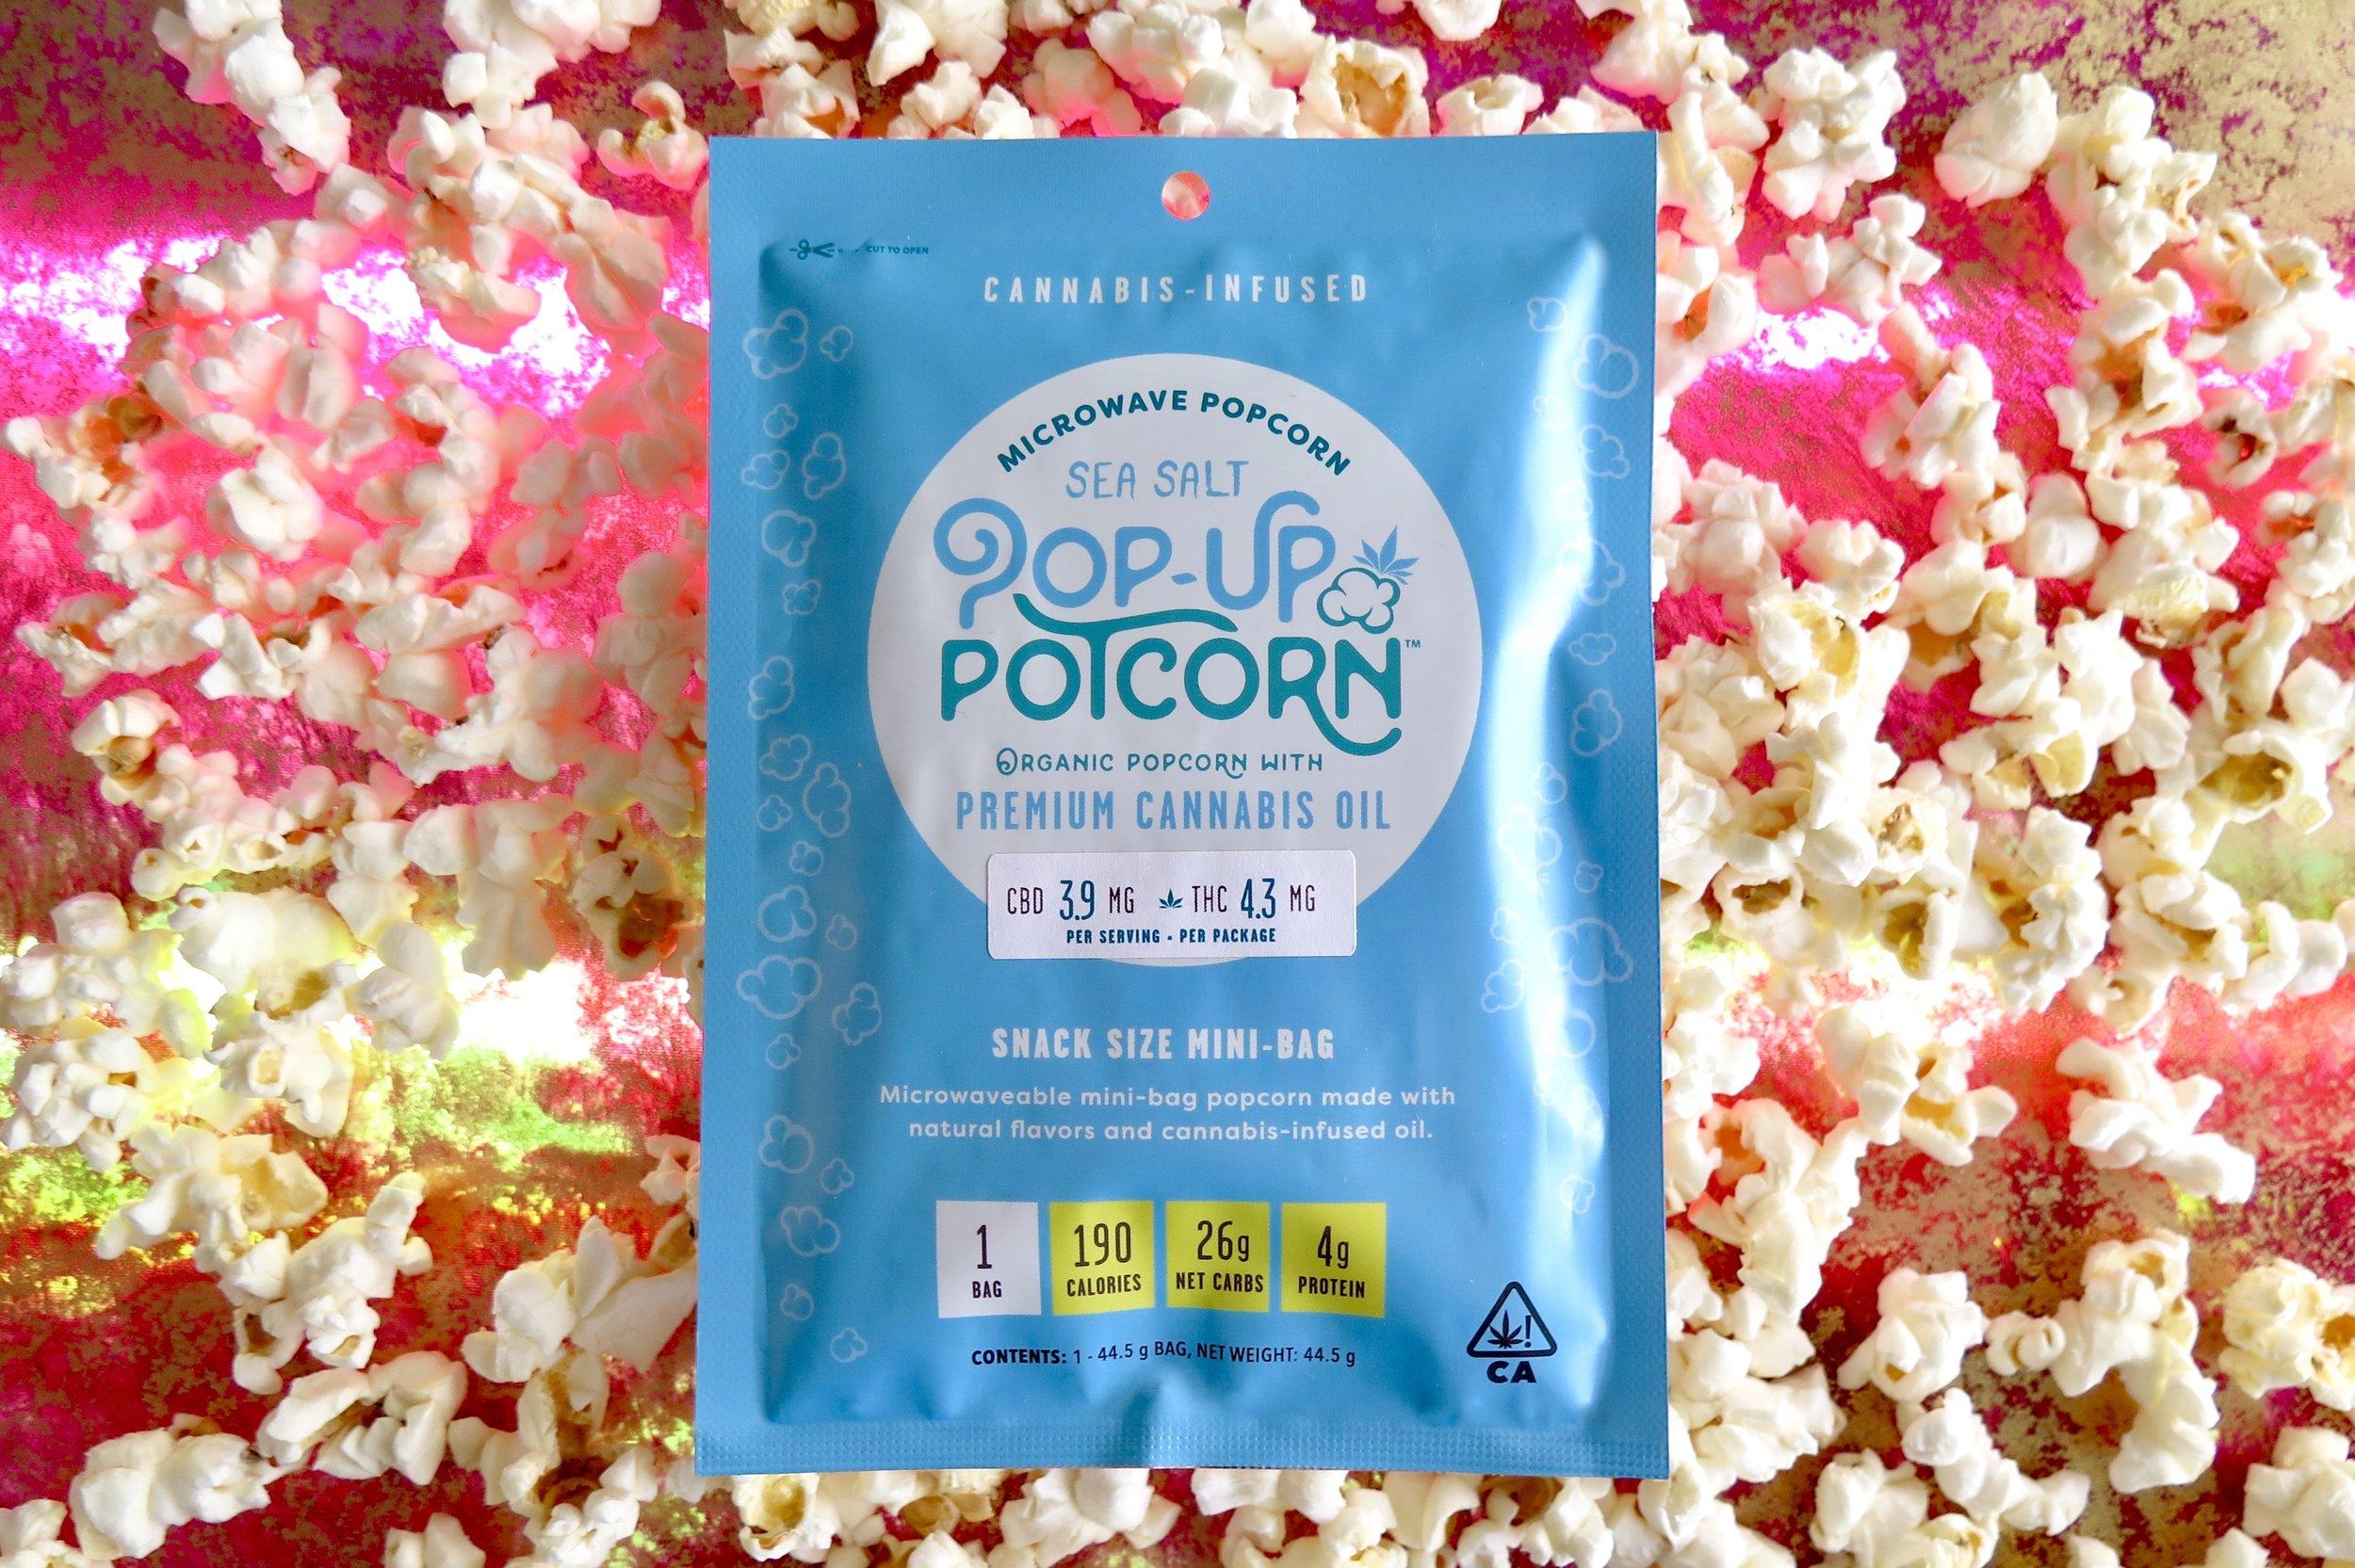 Pop-Up Potcorn's 1:1 version. Photo: Marcia Gagliardi. © mymilligram. Styling: Christian Jusinski/ Surfacehaus .